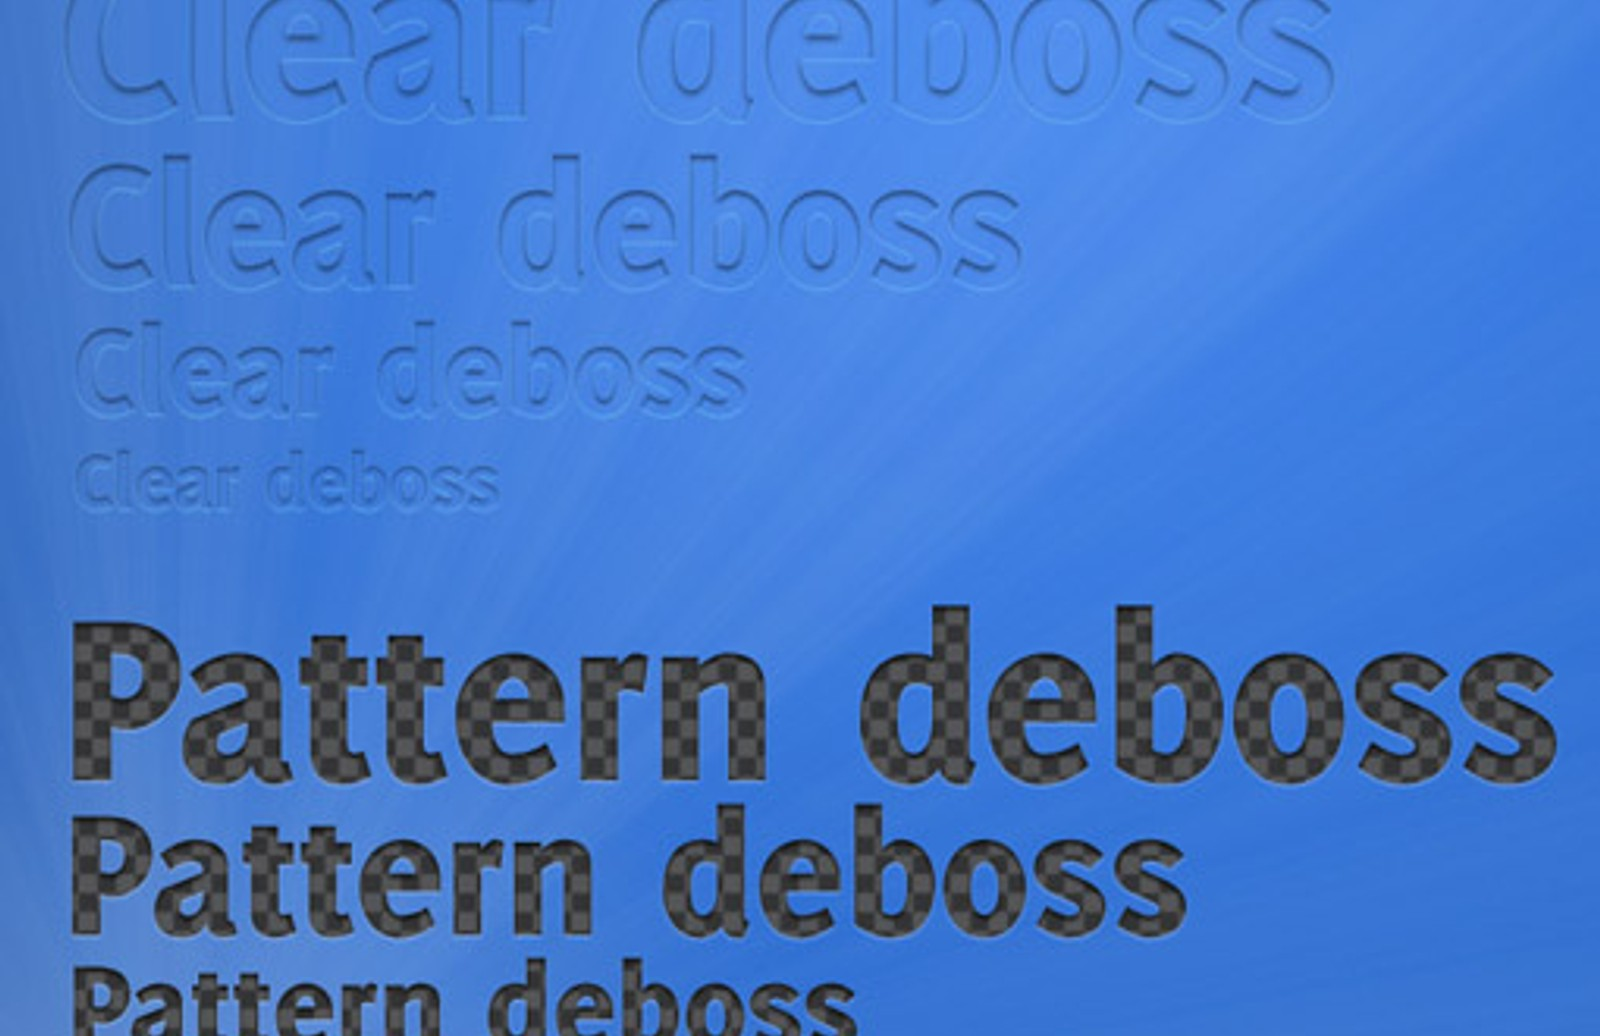 Deboss Text Styles